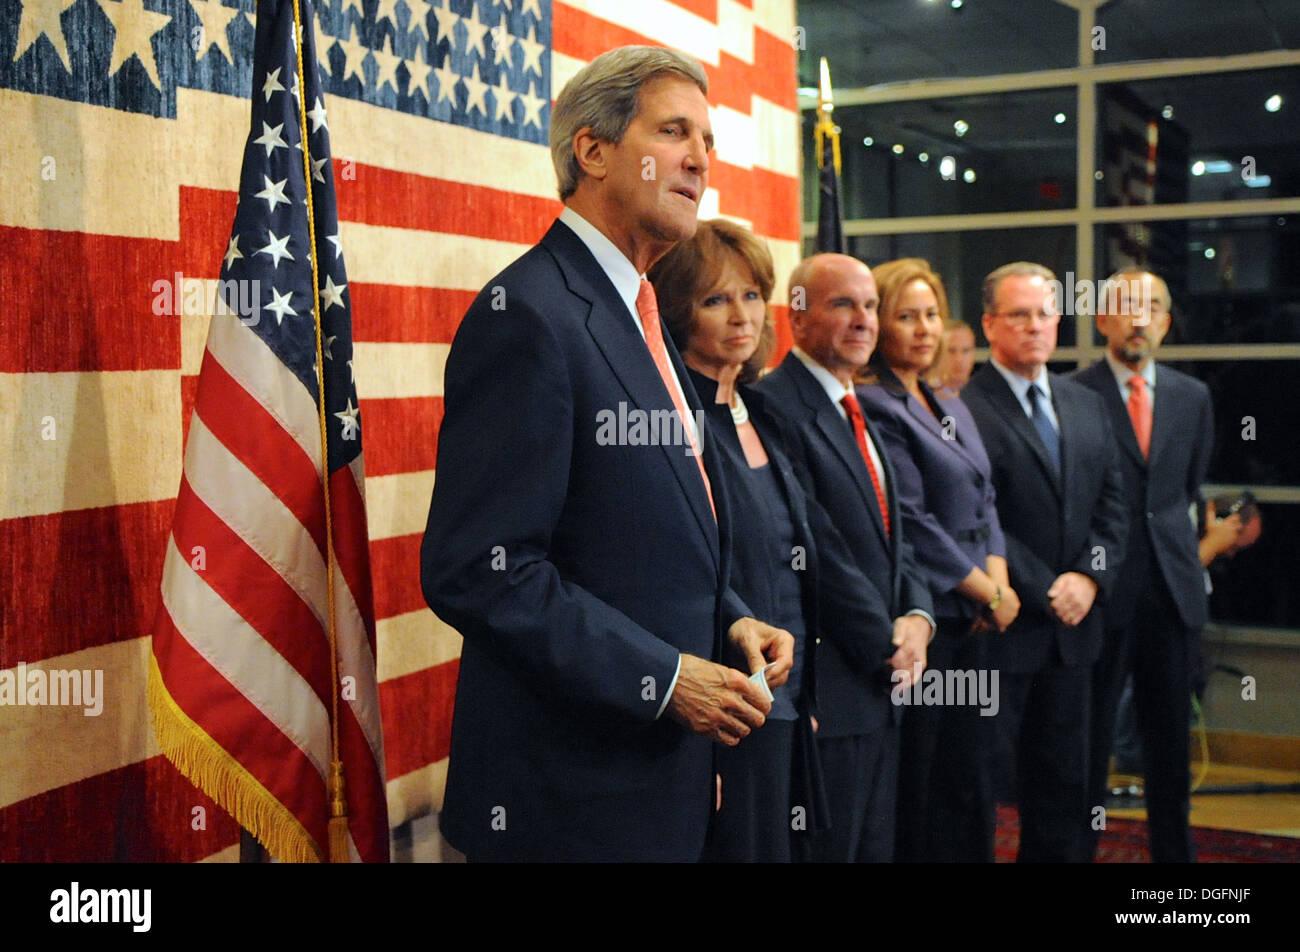 Secretary Kerry Attends Embassy Kabul Meet-and-Greet - Stock Image